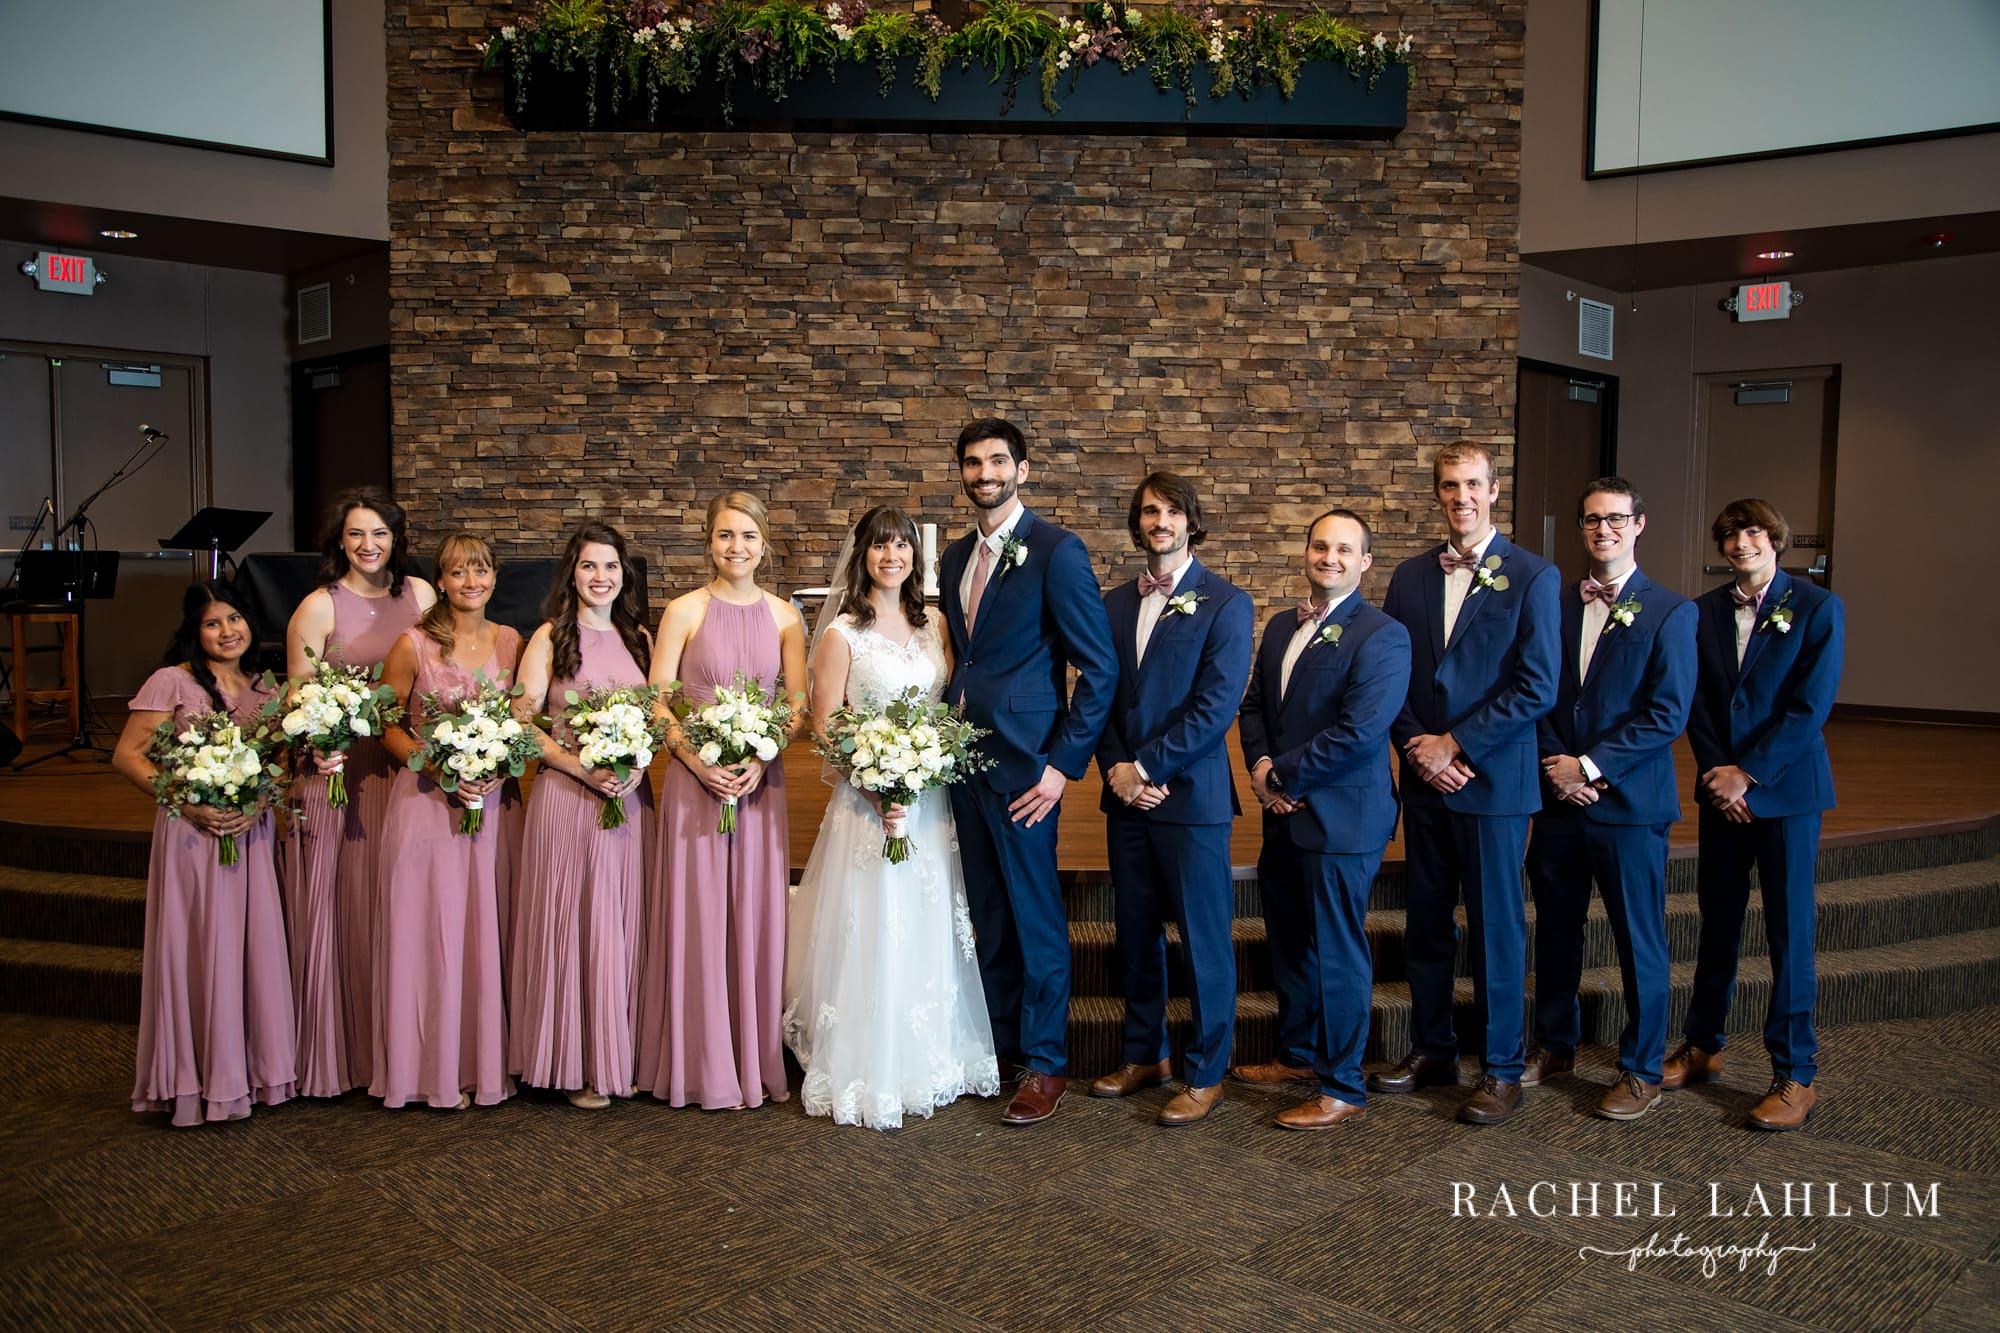 Bridal party portrait before ceremony at Eden Baptist Church, Burnsville, Minnesota.